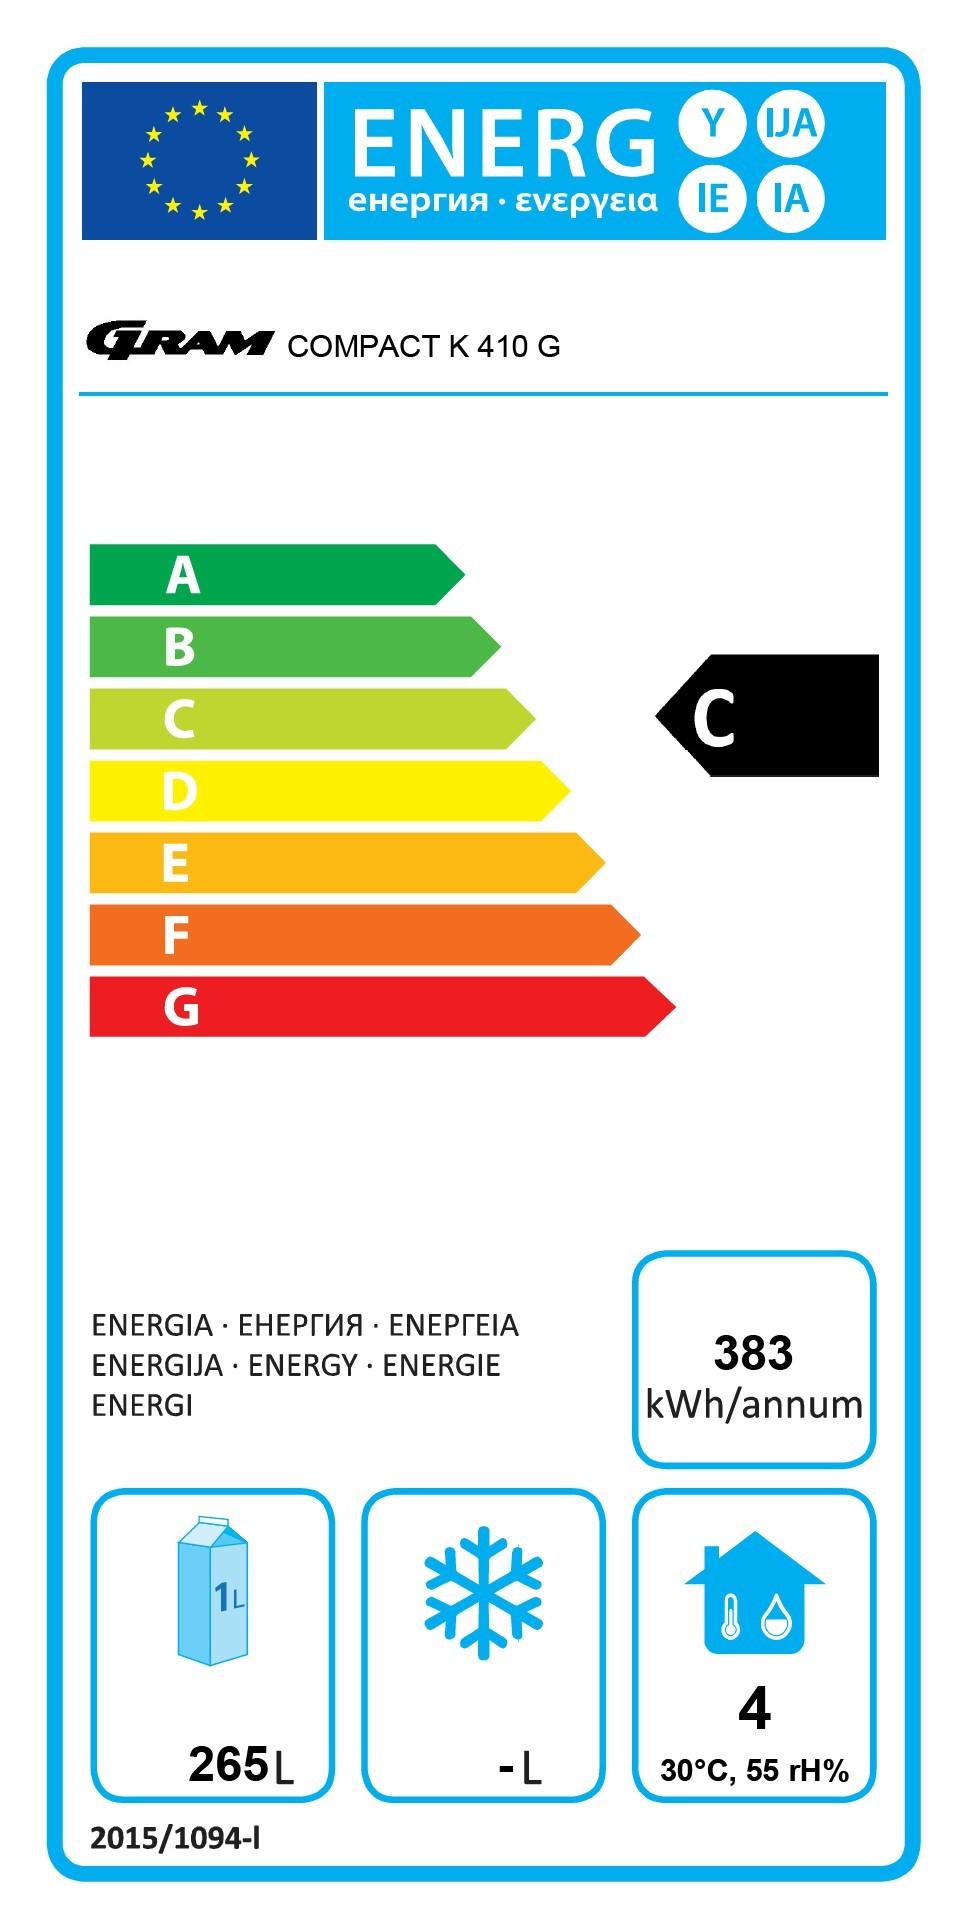 COMPACT KG 410 LG C 6W 346 Ltr Glass Door Display Fridge Energy Rating